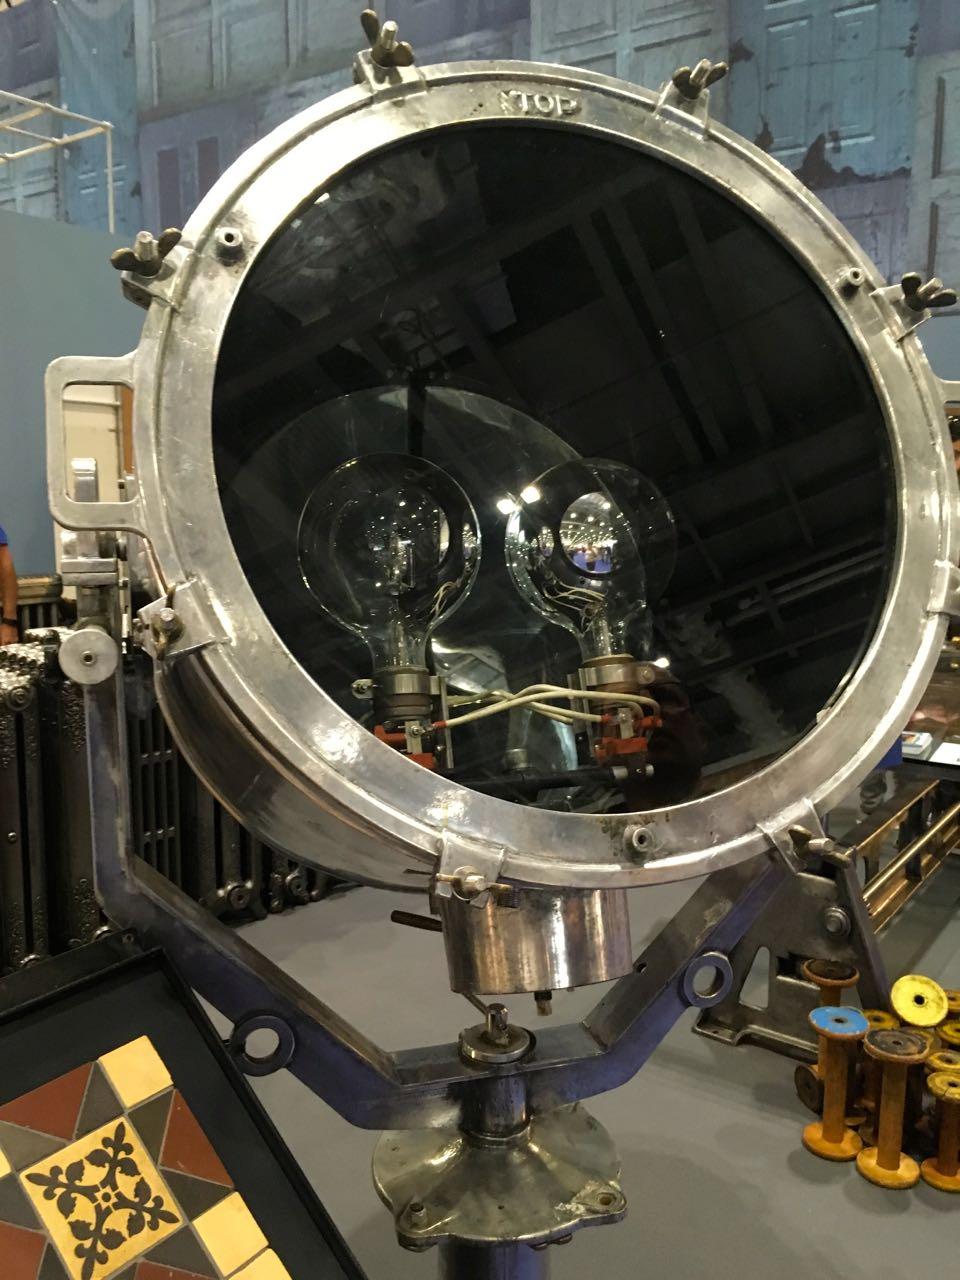 A vintage industrial light